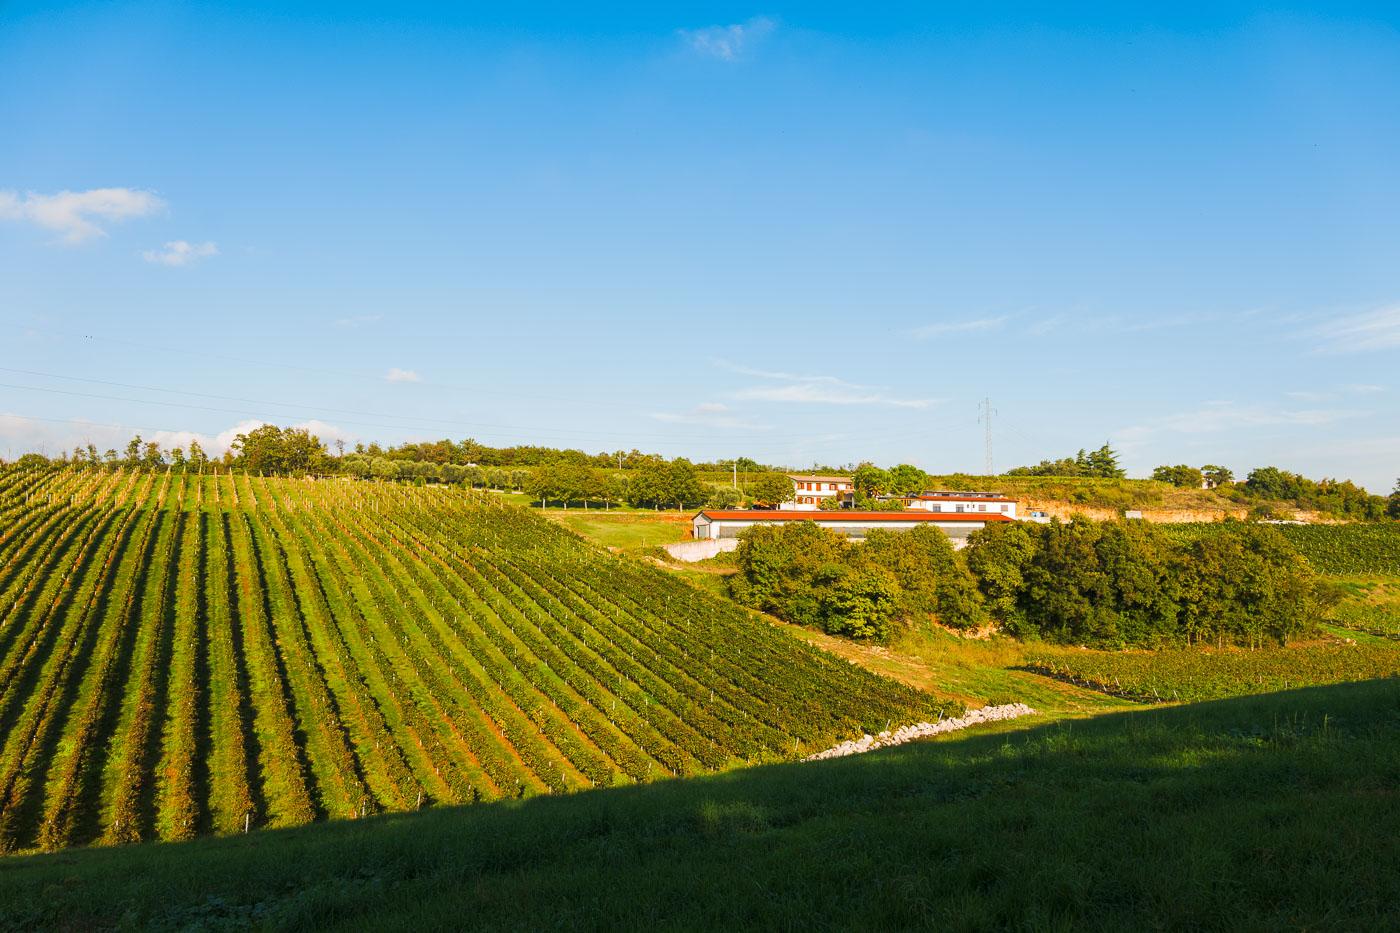 Svinamento-naturale-vino-uva-merlot-maule-sauro-fotografo-rui-L1120299_p_Lr_web